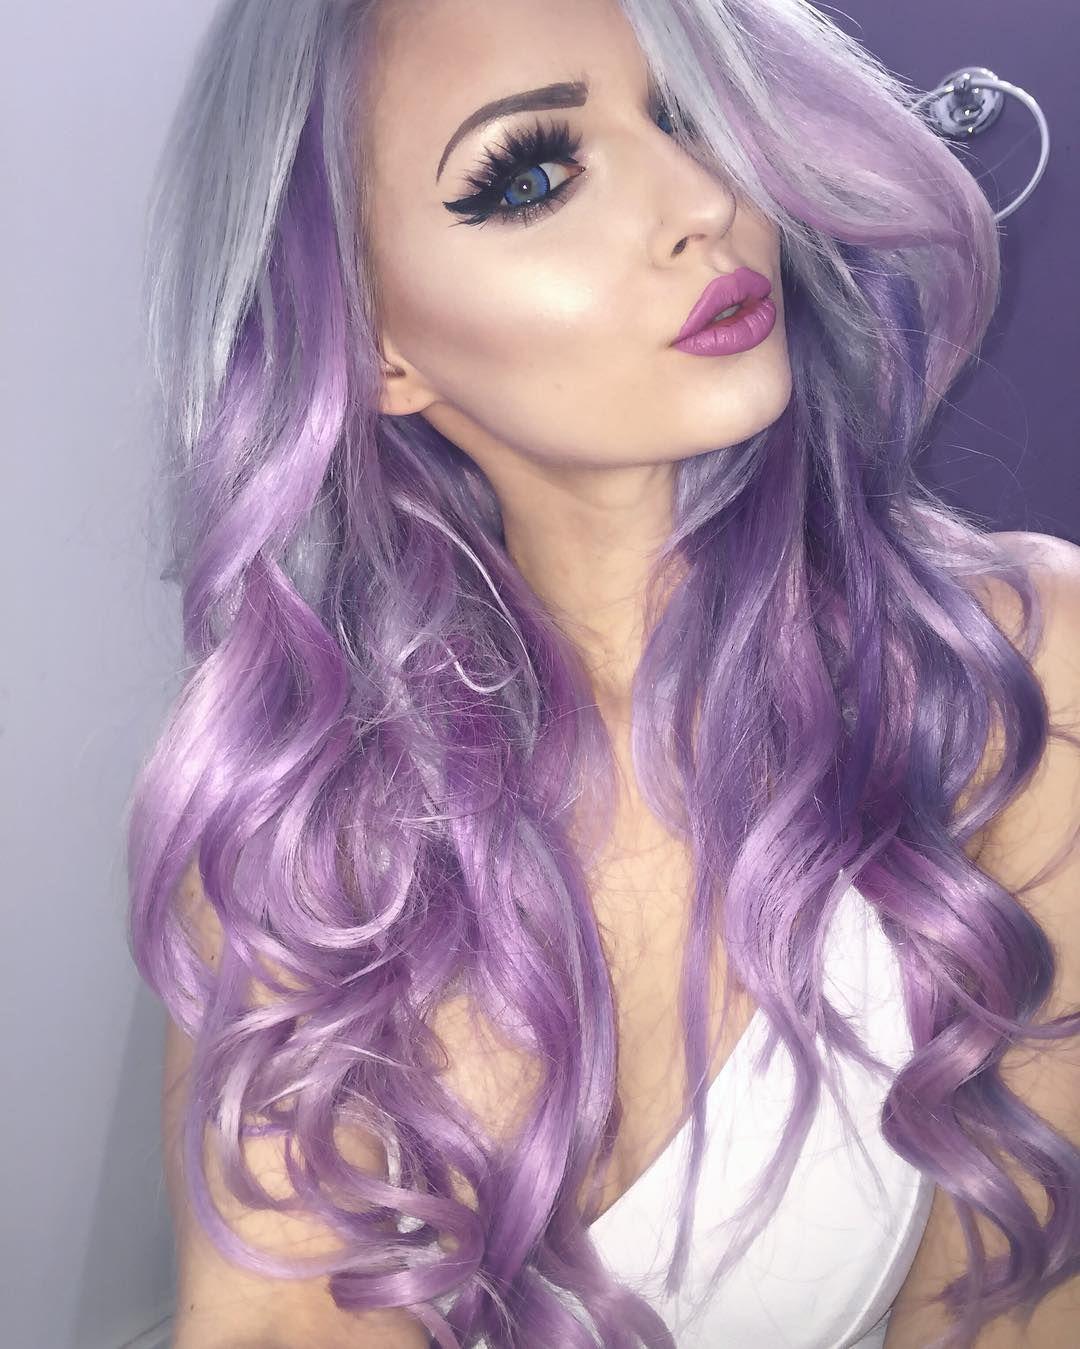 Alyssa claire purplesneakers titanium silver with